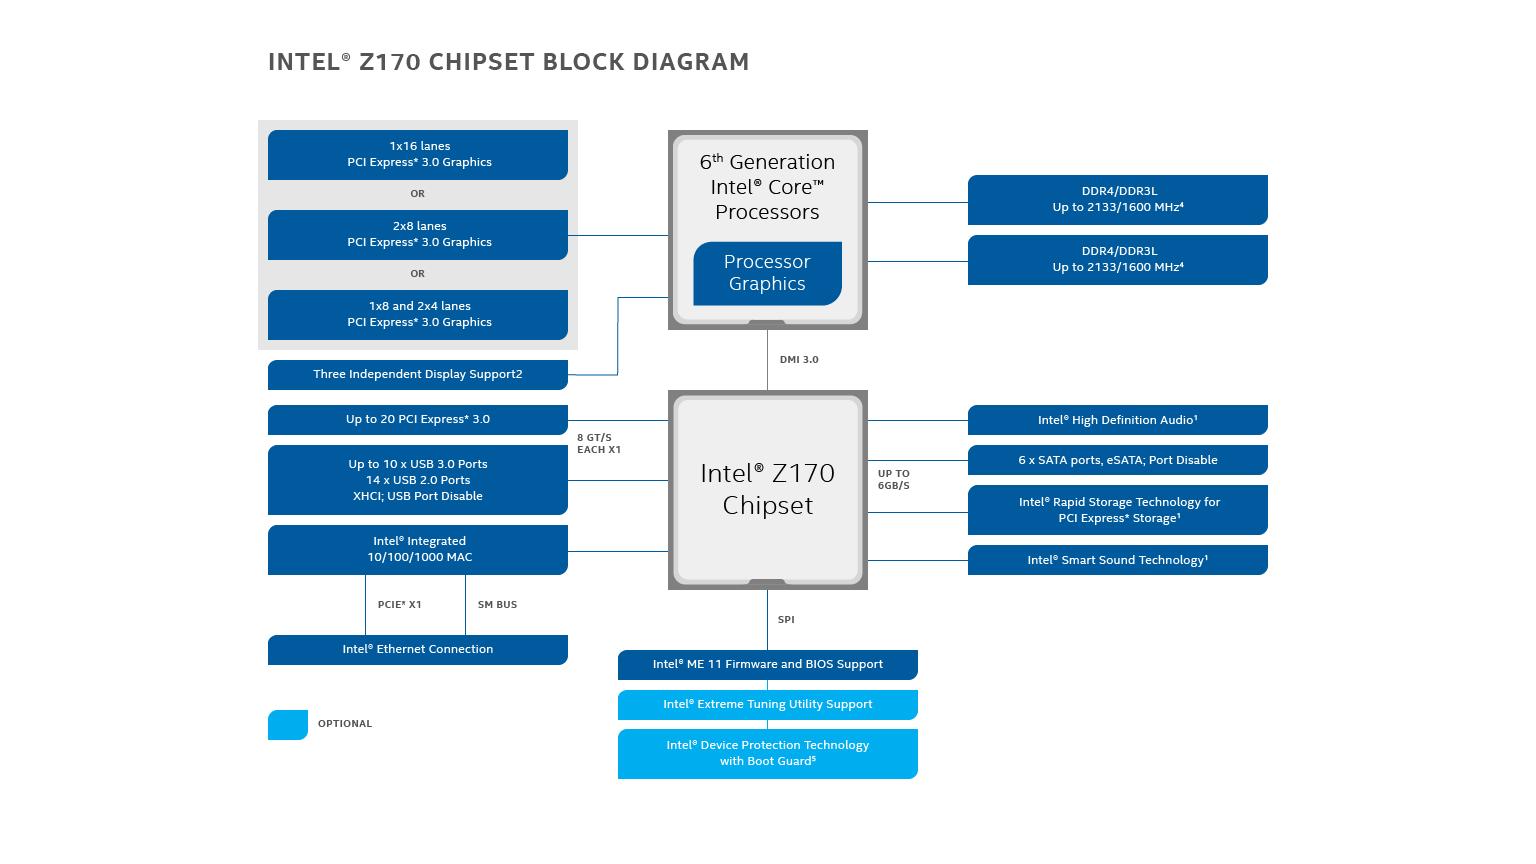 z170-chipset-block-diagram-16x9.png